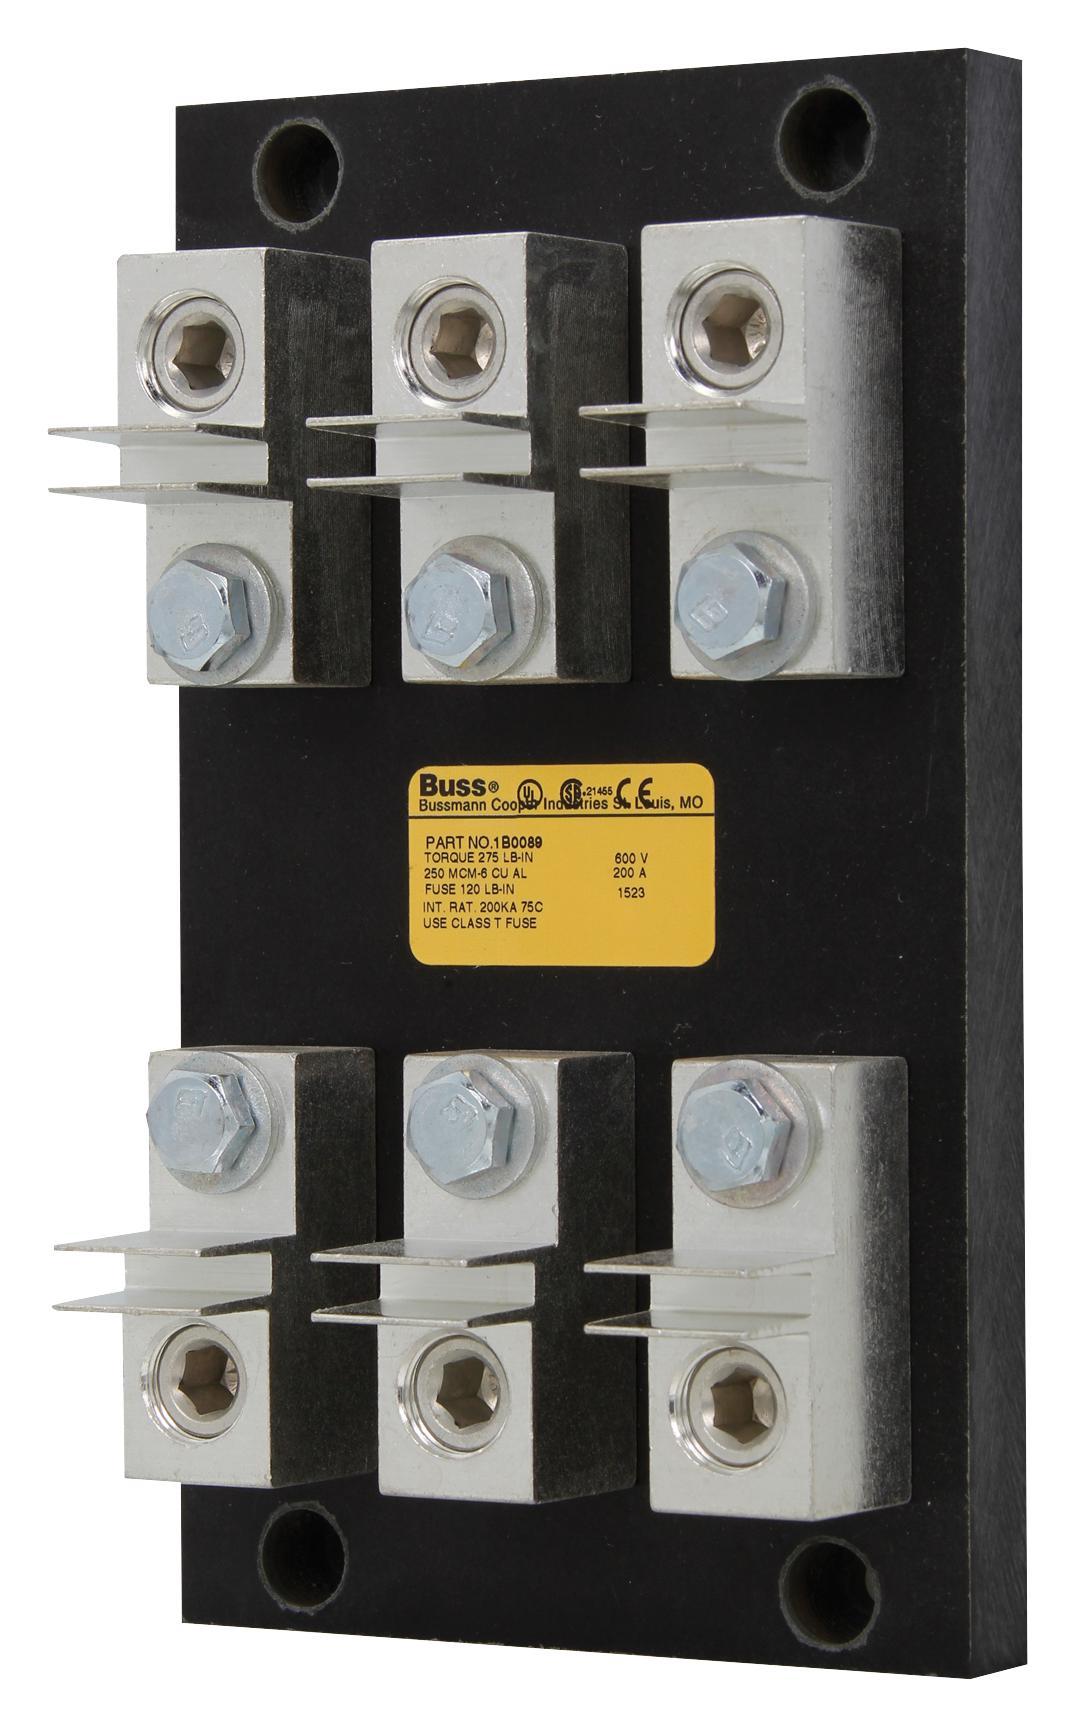 hight resolution of 1b0089 cartridge fuse holder